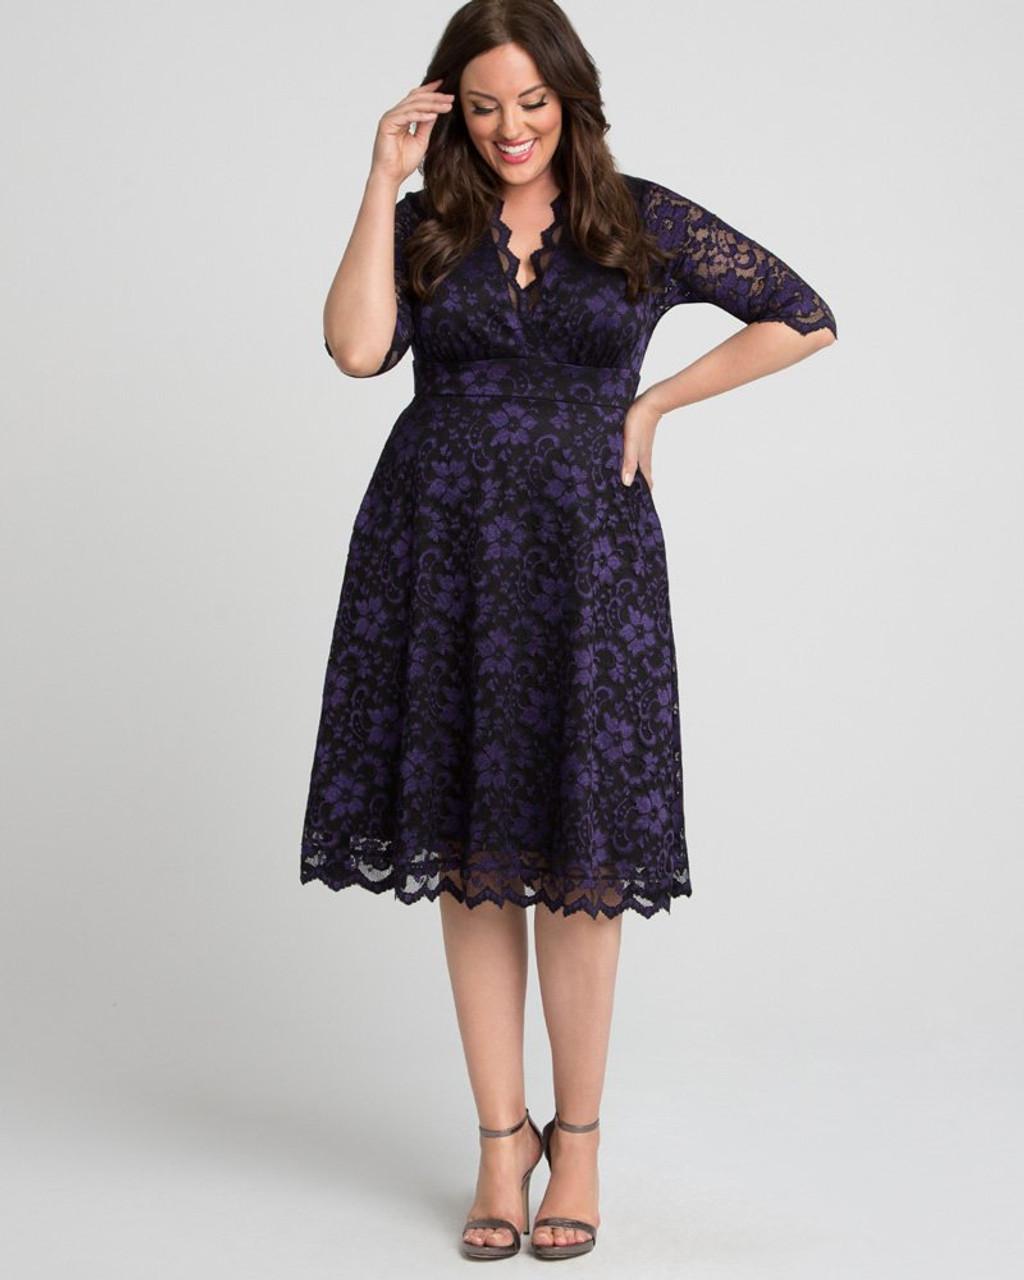 Kiyonna Women\'s Plus Size Mon Cherie Lace Dress~Black/Purple/Blue*1180906